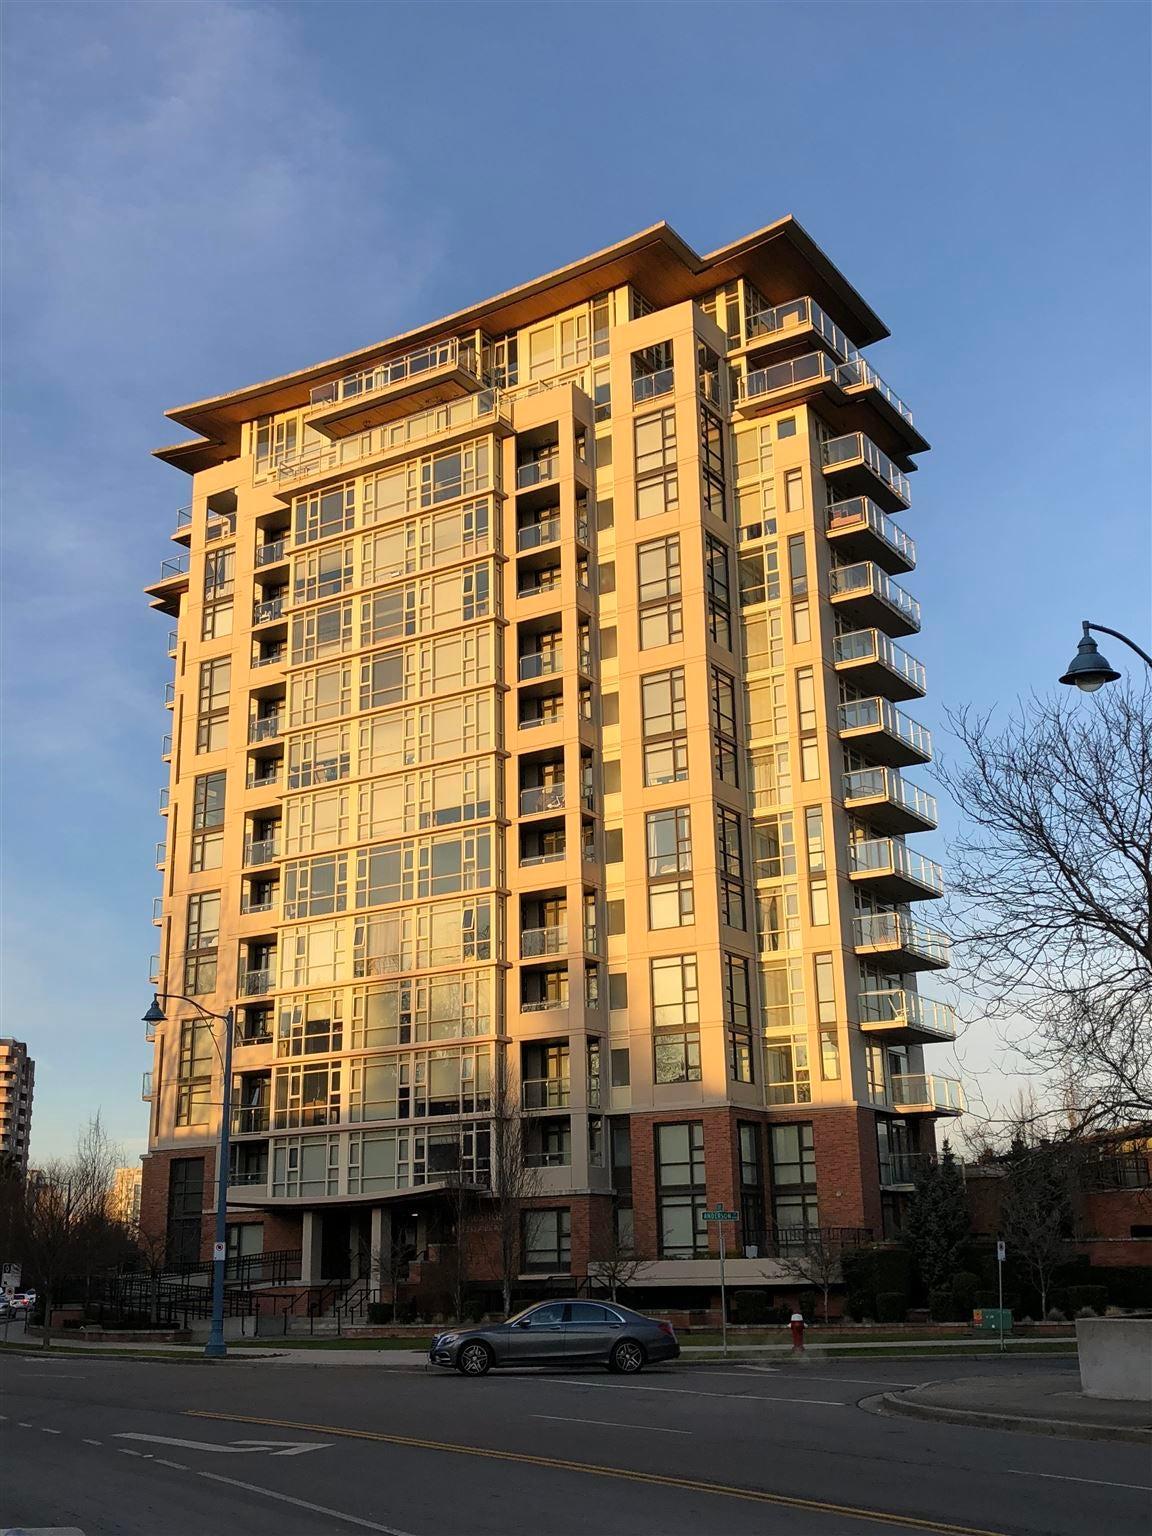 507 8333 ANDERSON ROAD - Brighouse Apartment/Condo for sale, 2 Bedrooms (R2605606)